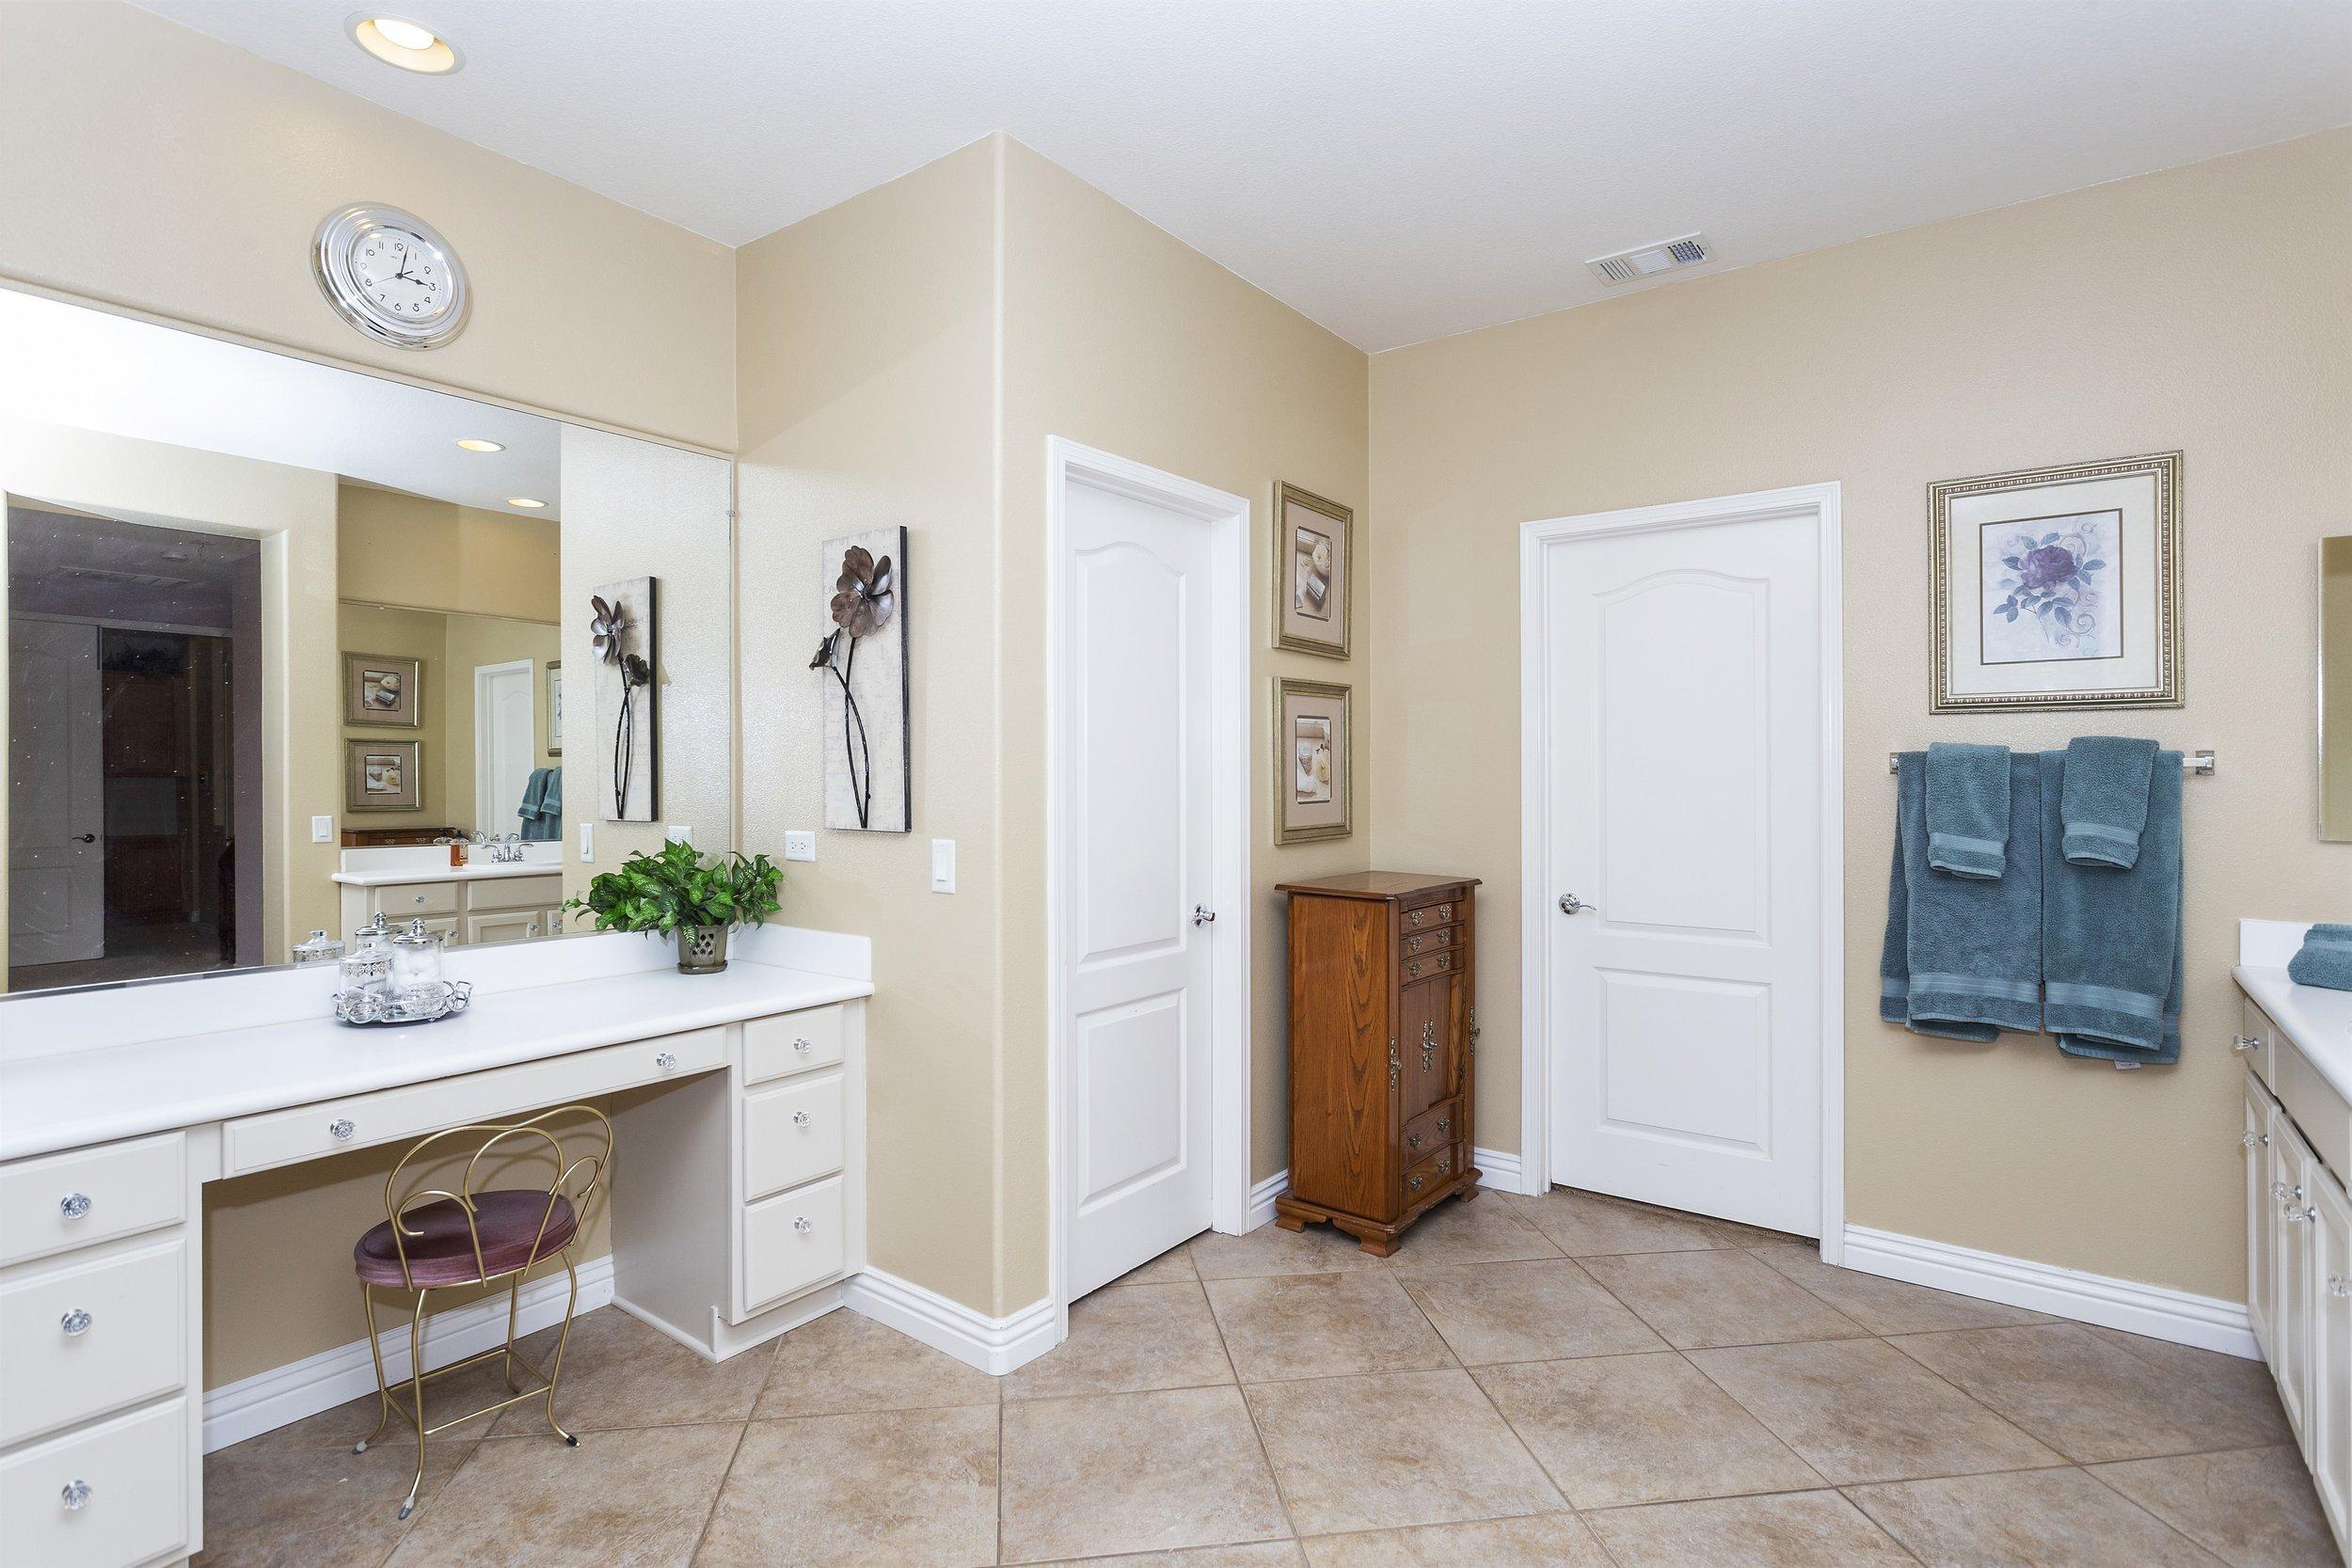 040_2nd Floor Master Bathroom.jpg